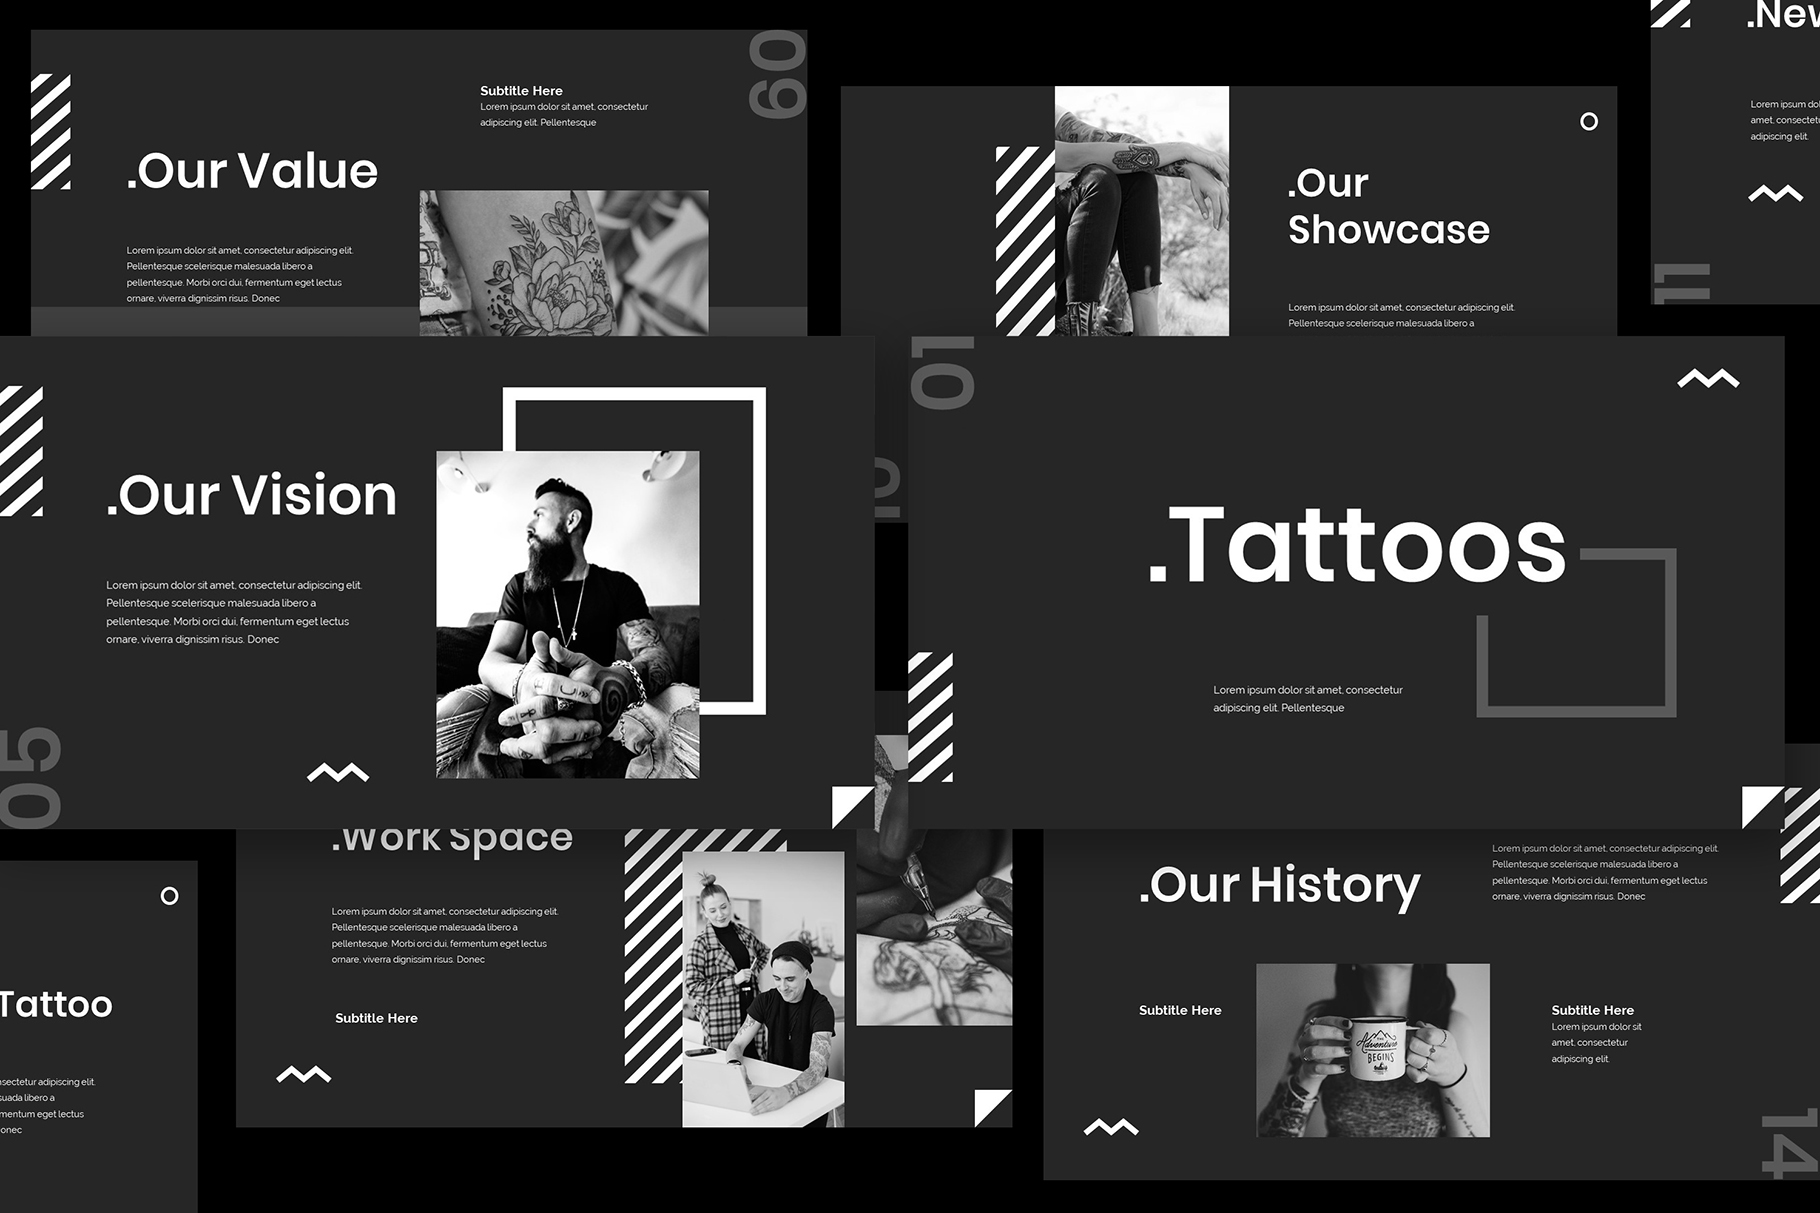 Tattoo Powerpoint Presentation example image 2